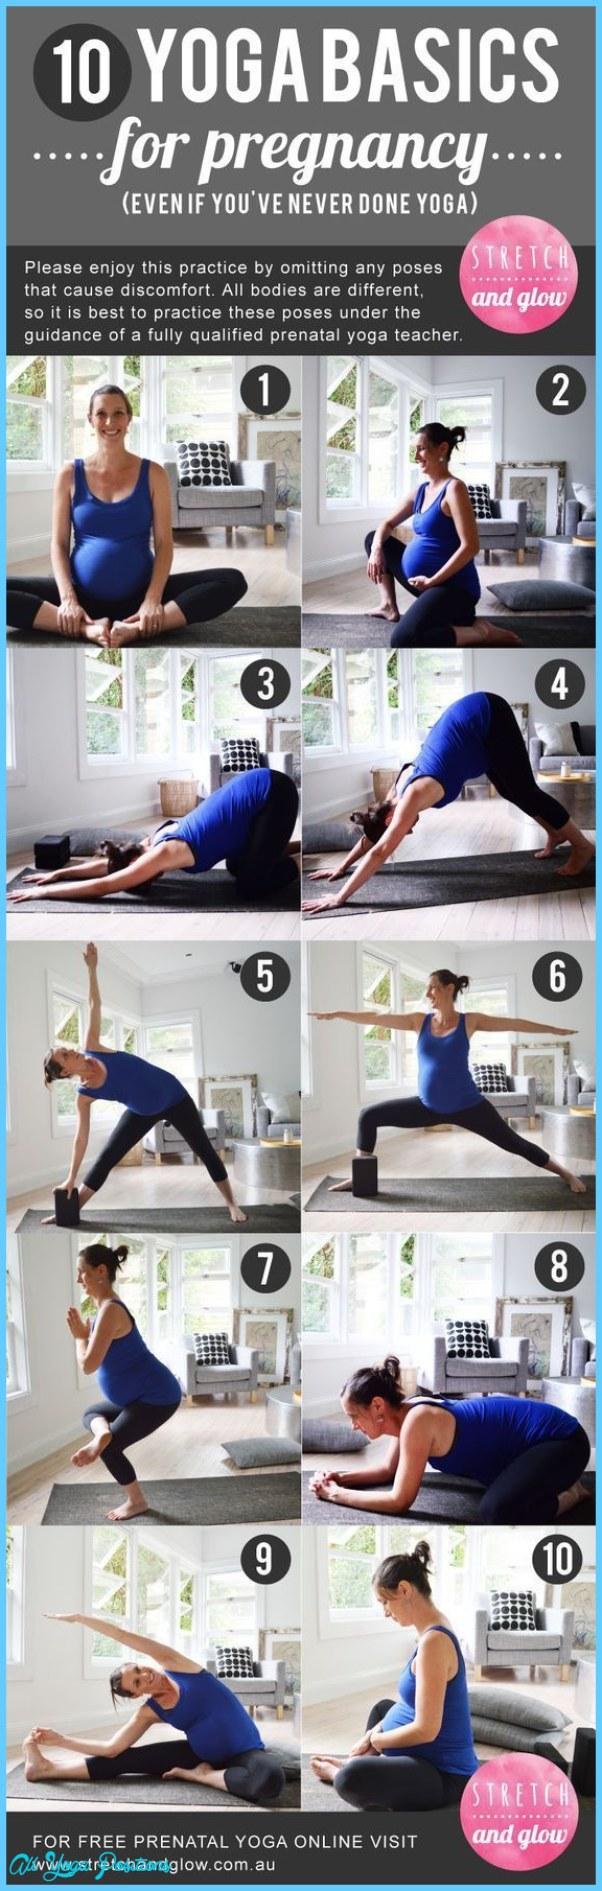 Pregnancy Yoga Poses To Avoid_11.jpg